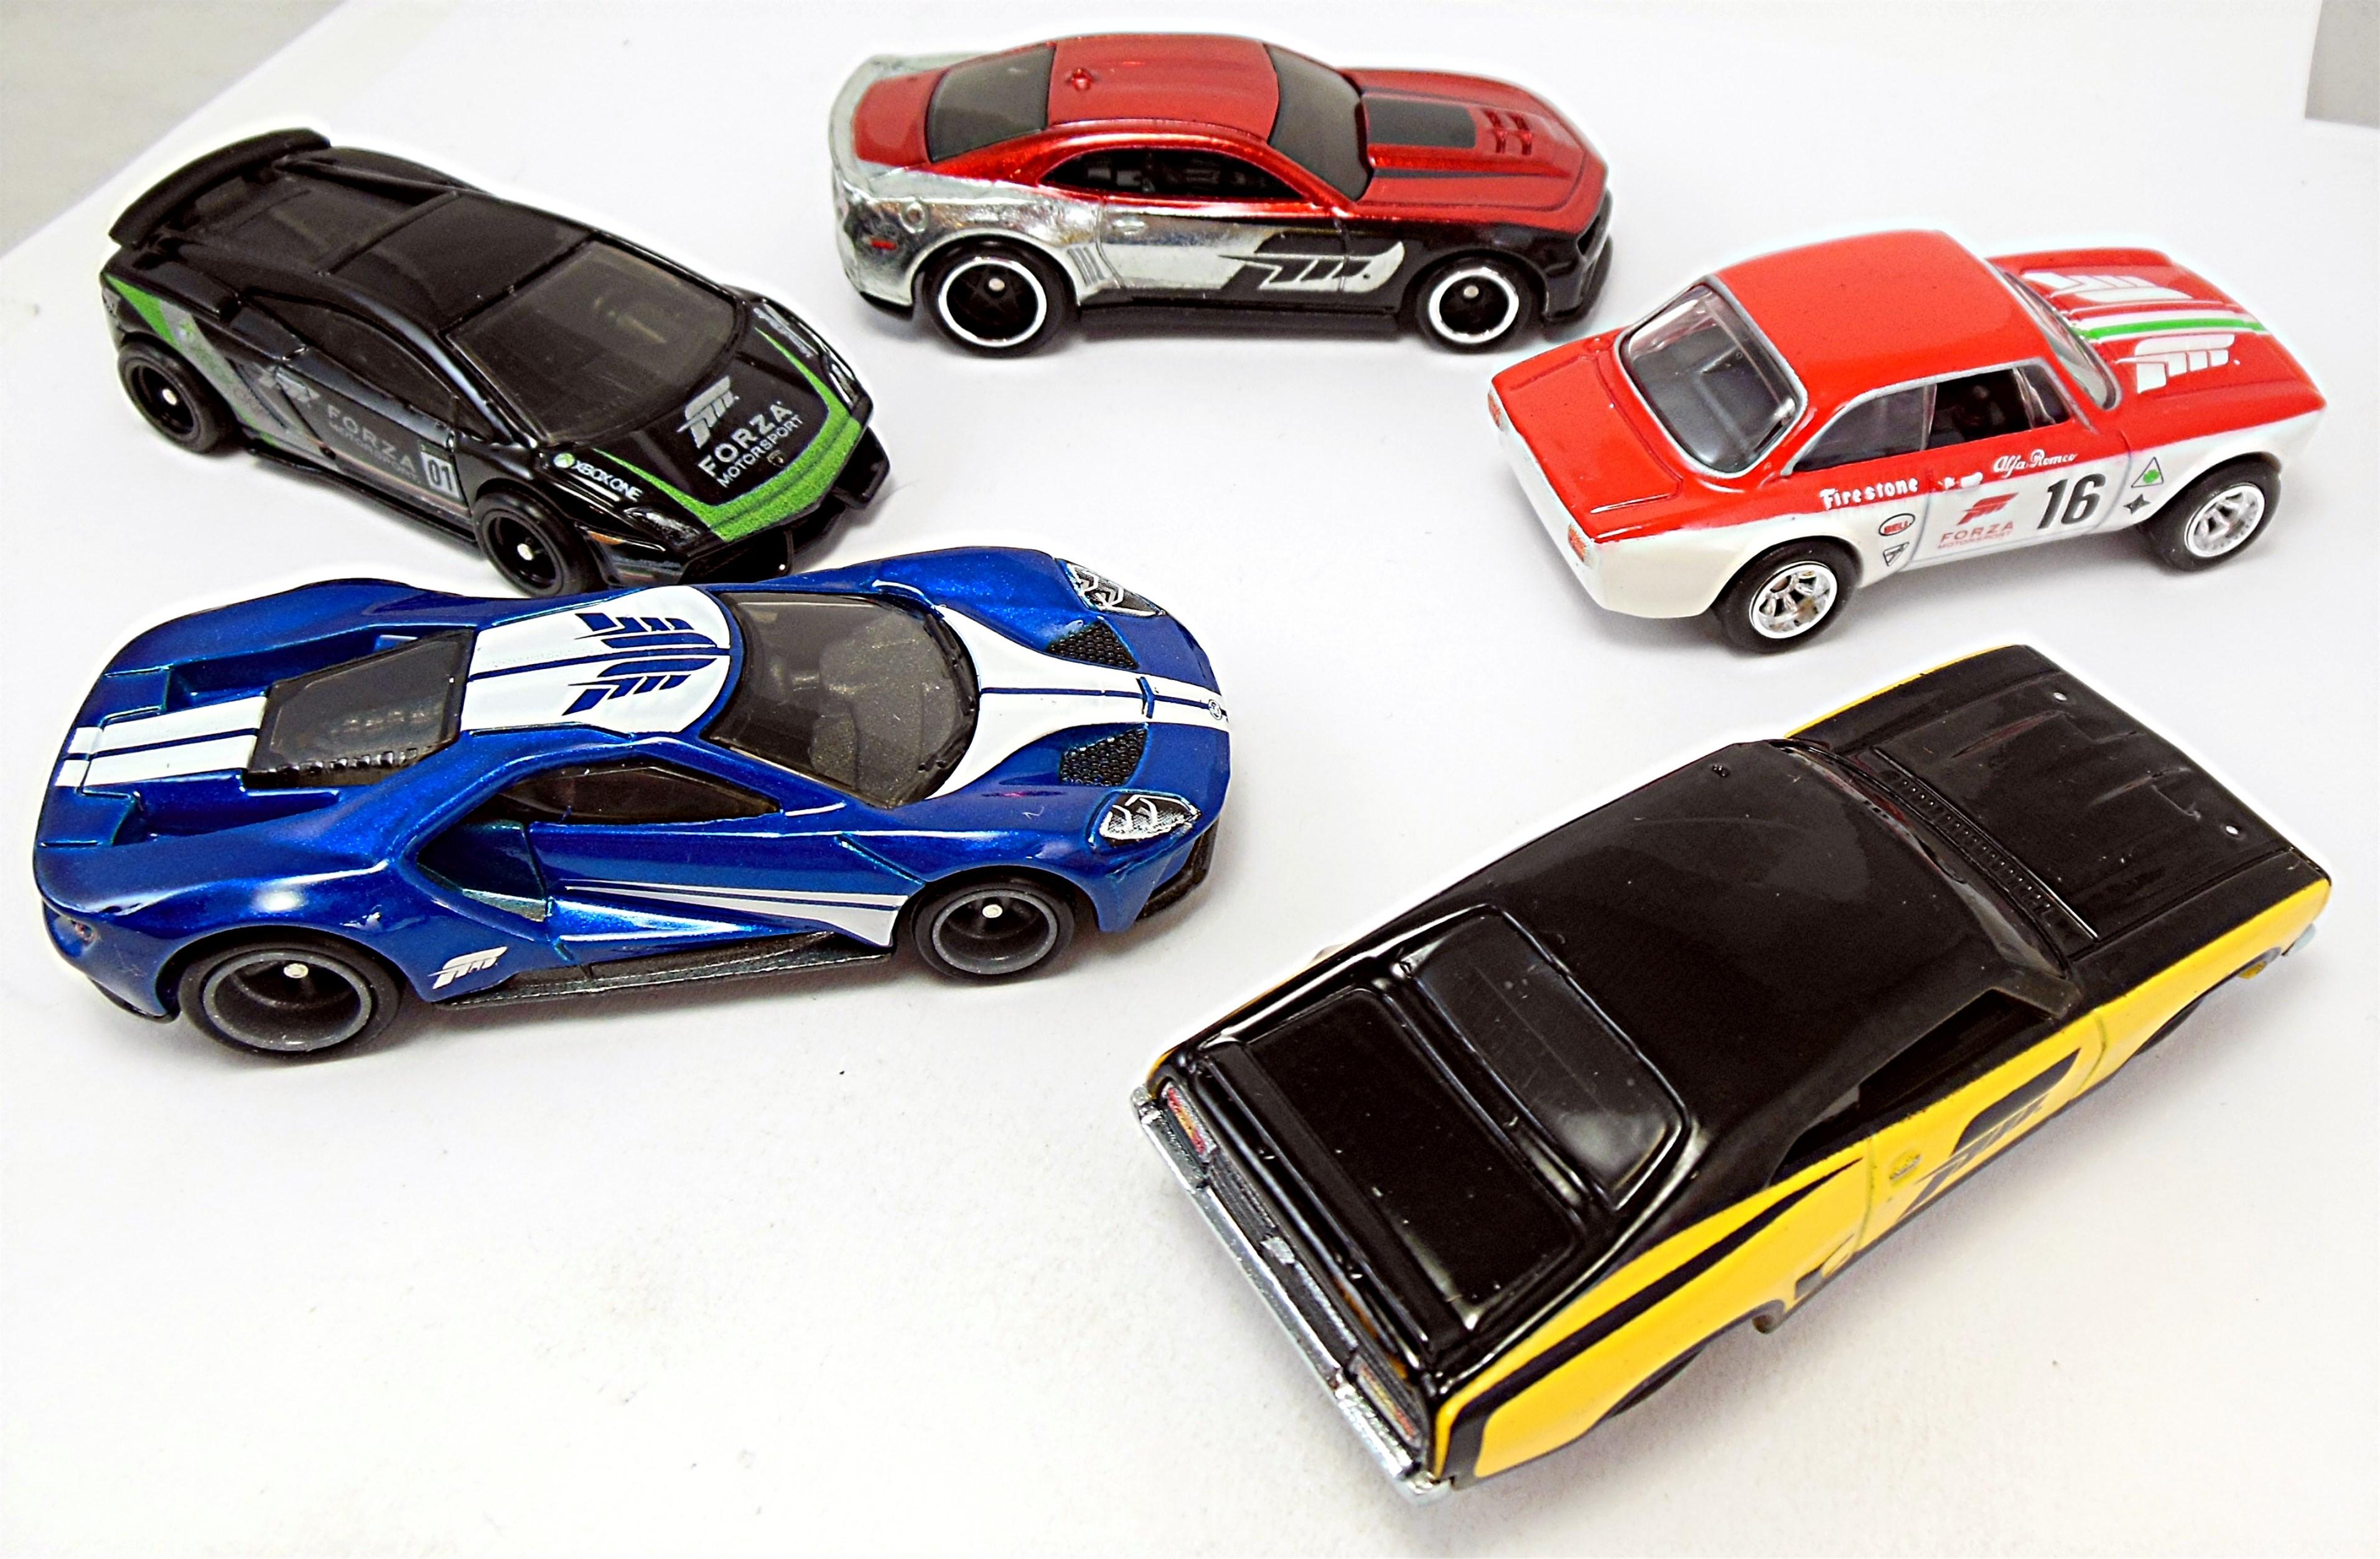 Hot Wheels clipart vehicle Forza Newsletter Wheels Hot Diecast